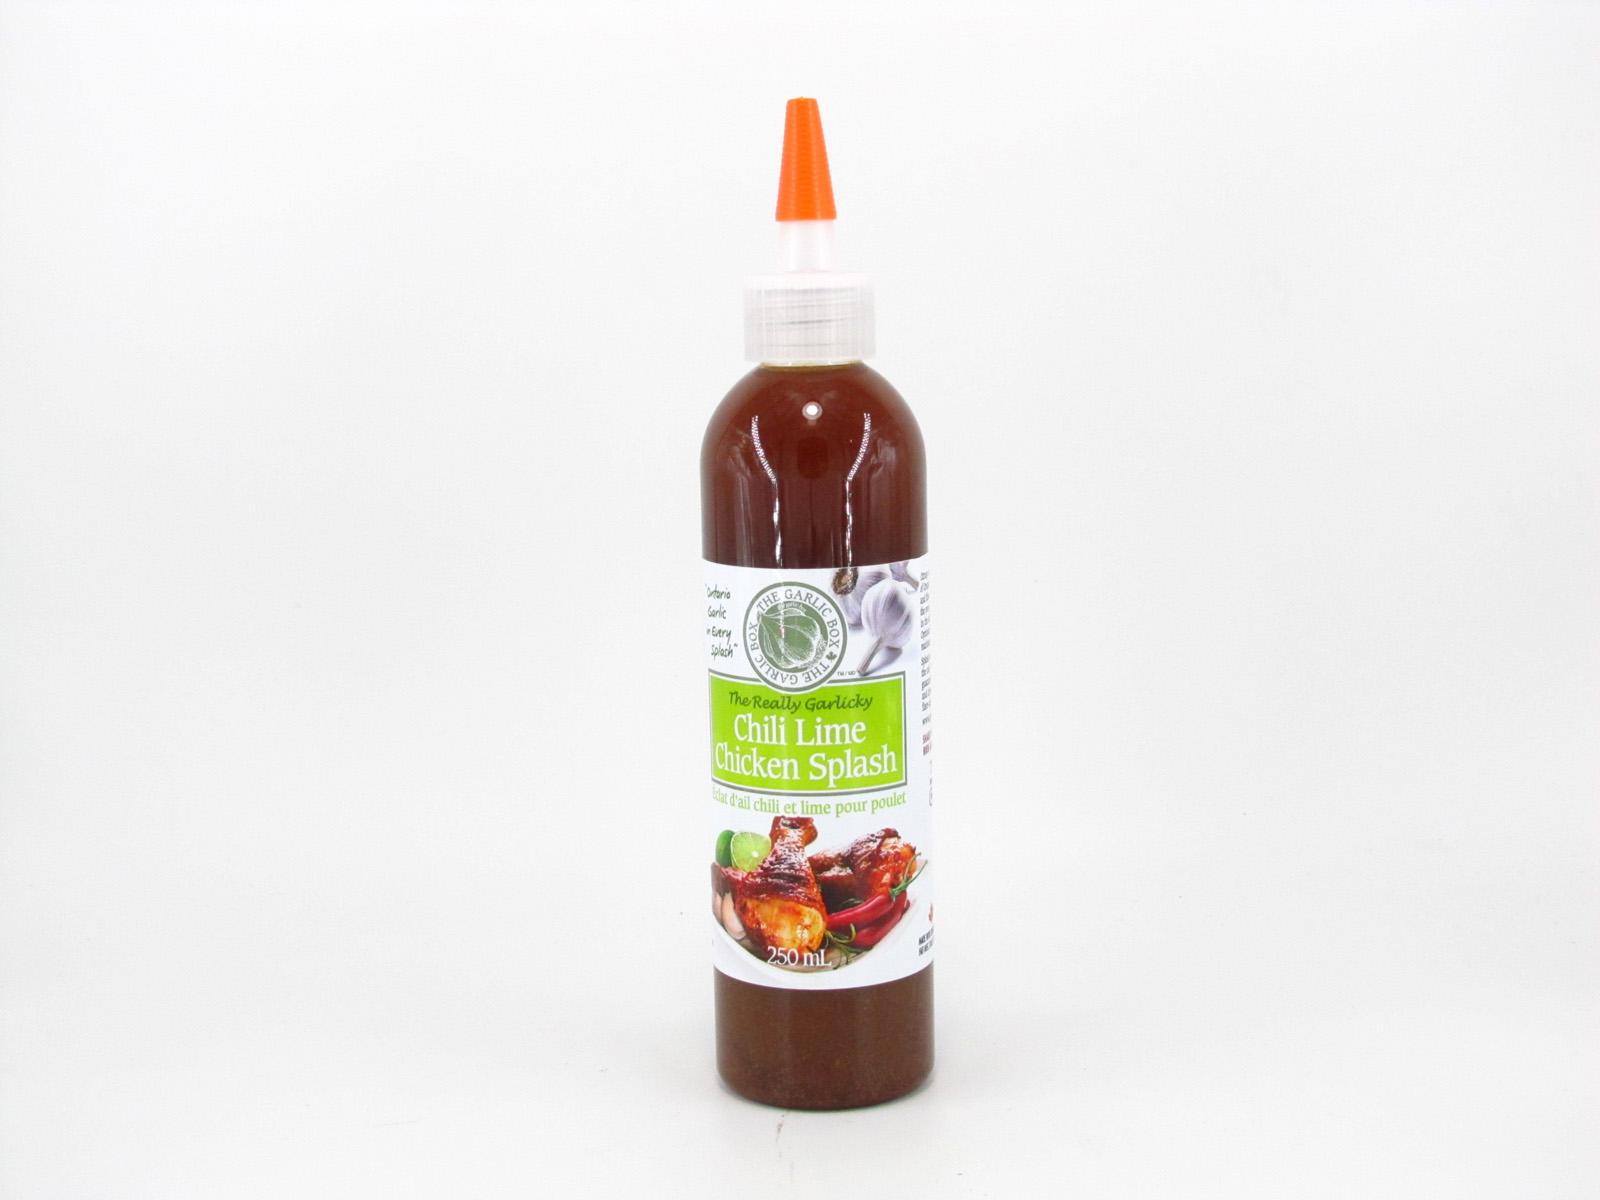 Splash - Chili Lime Chicken - front view